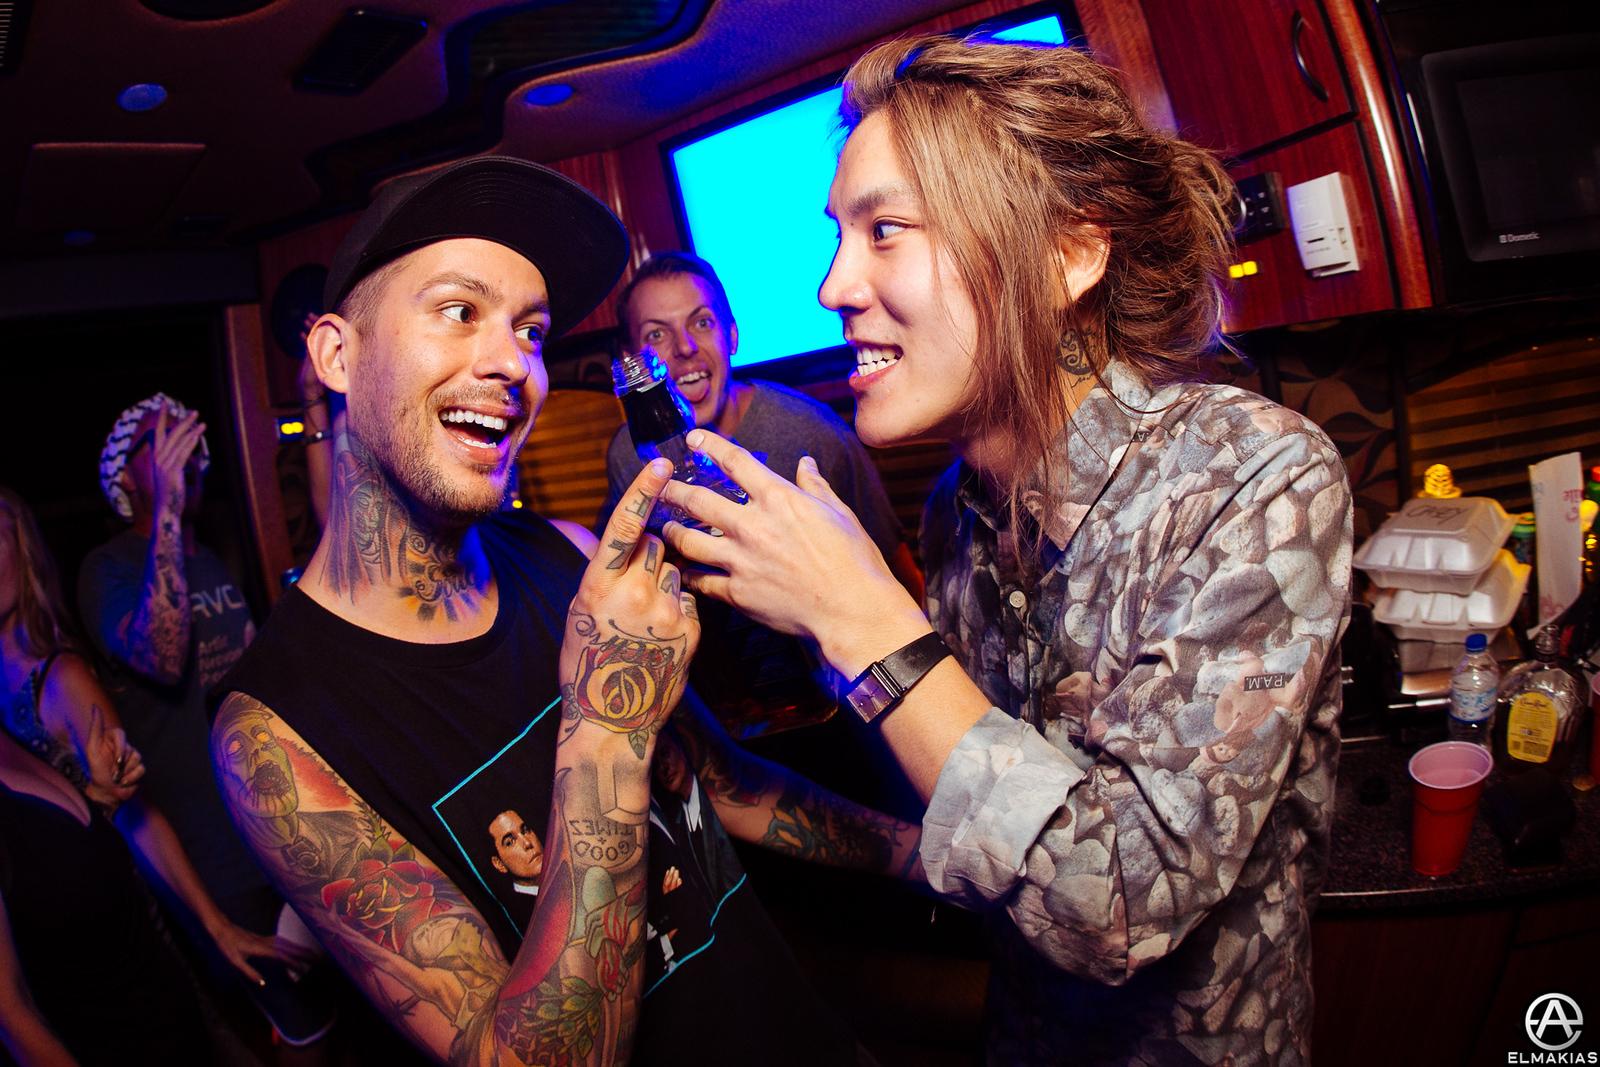 Party bus at Vans Warped Tour 2015 by Adam Elmakias